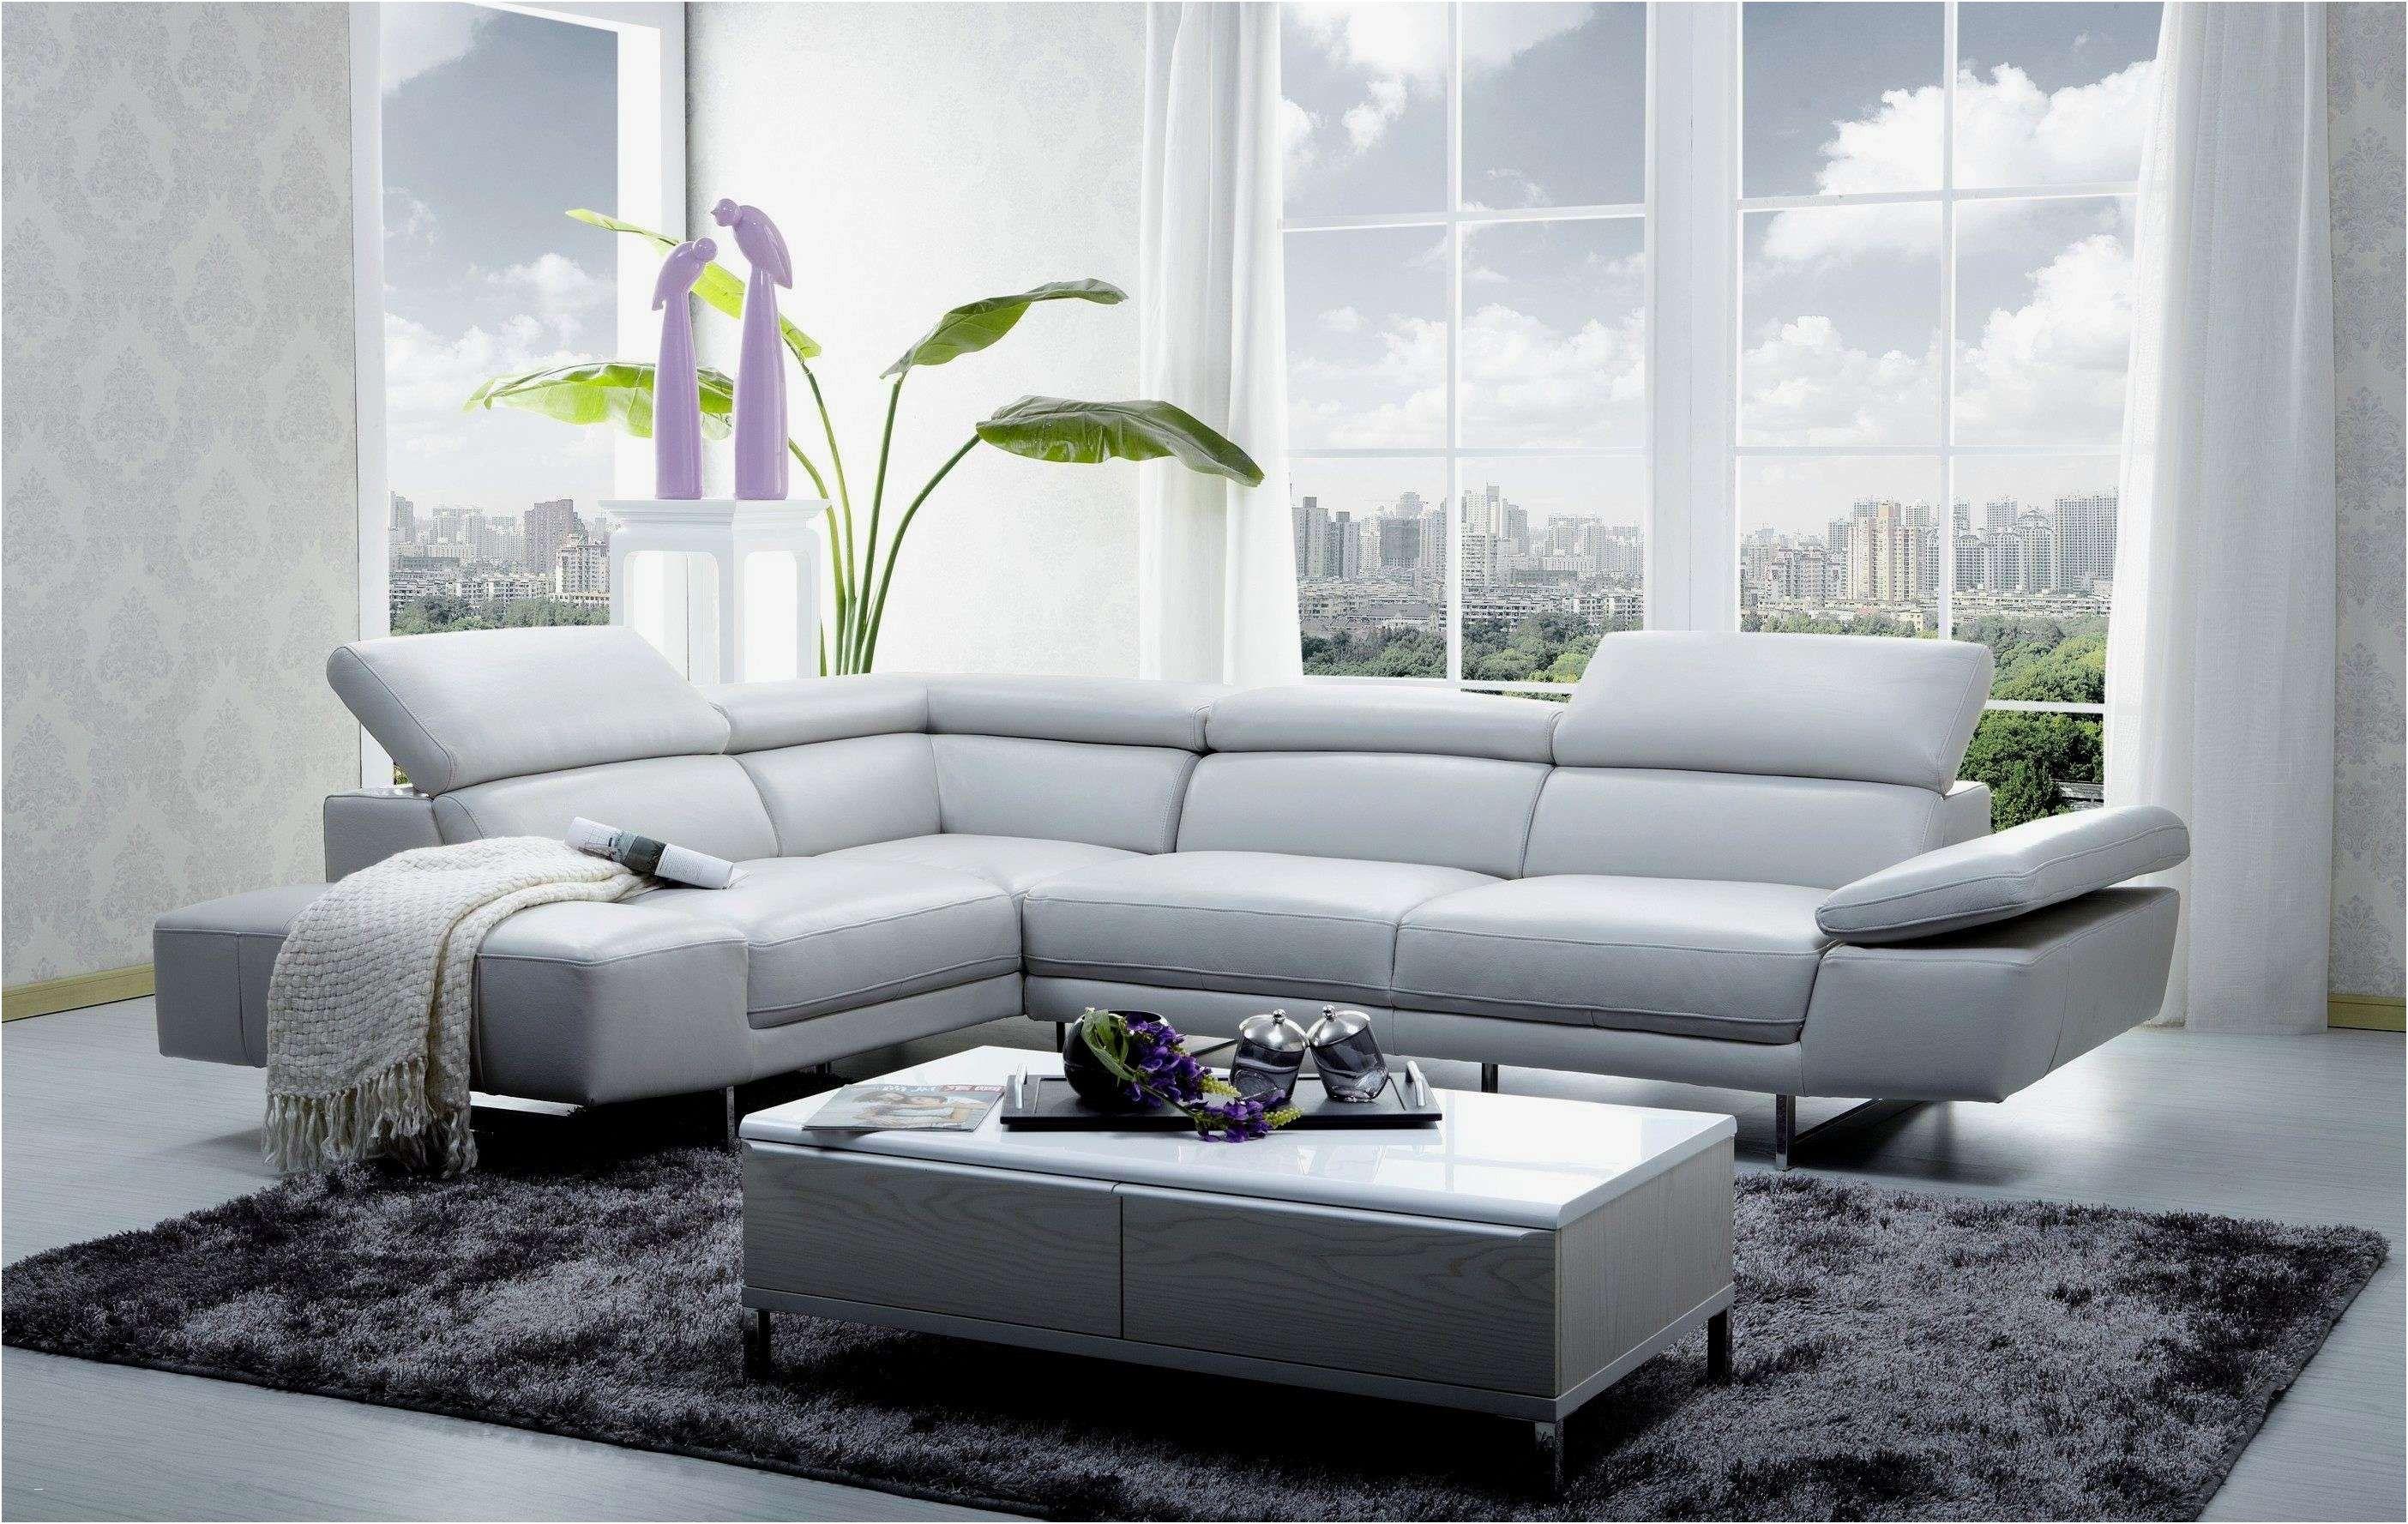 Ideal Wohnzimmer Otto   Set sofa, Sofa l, Mebel